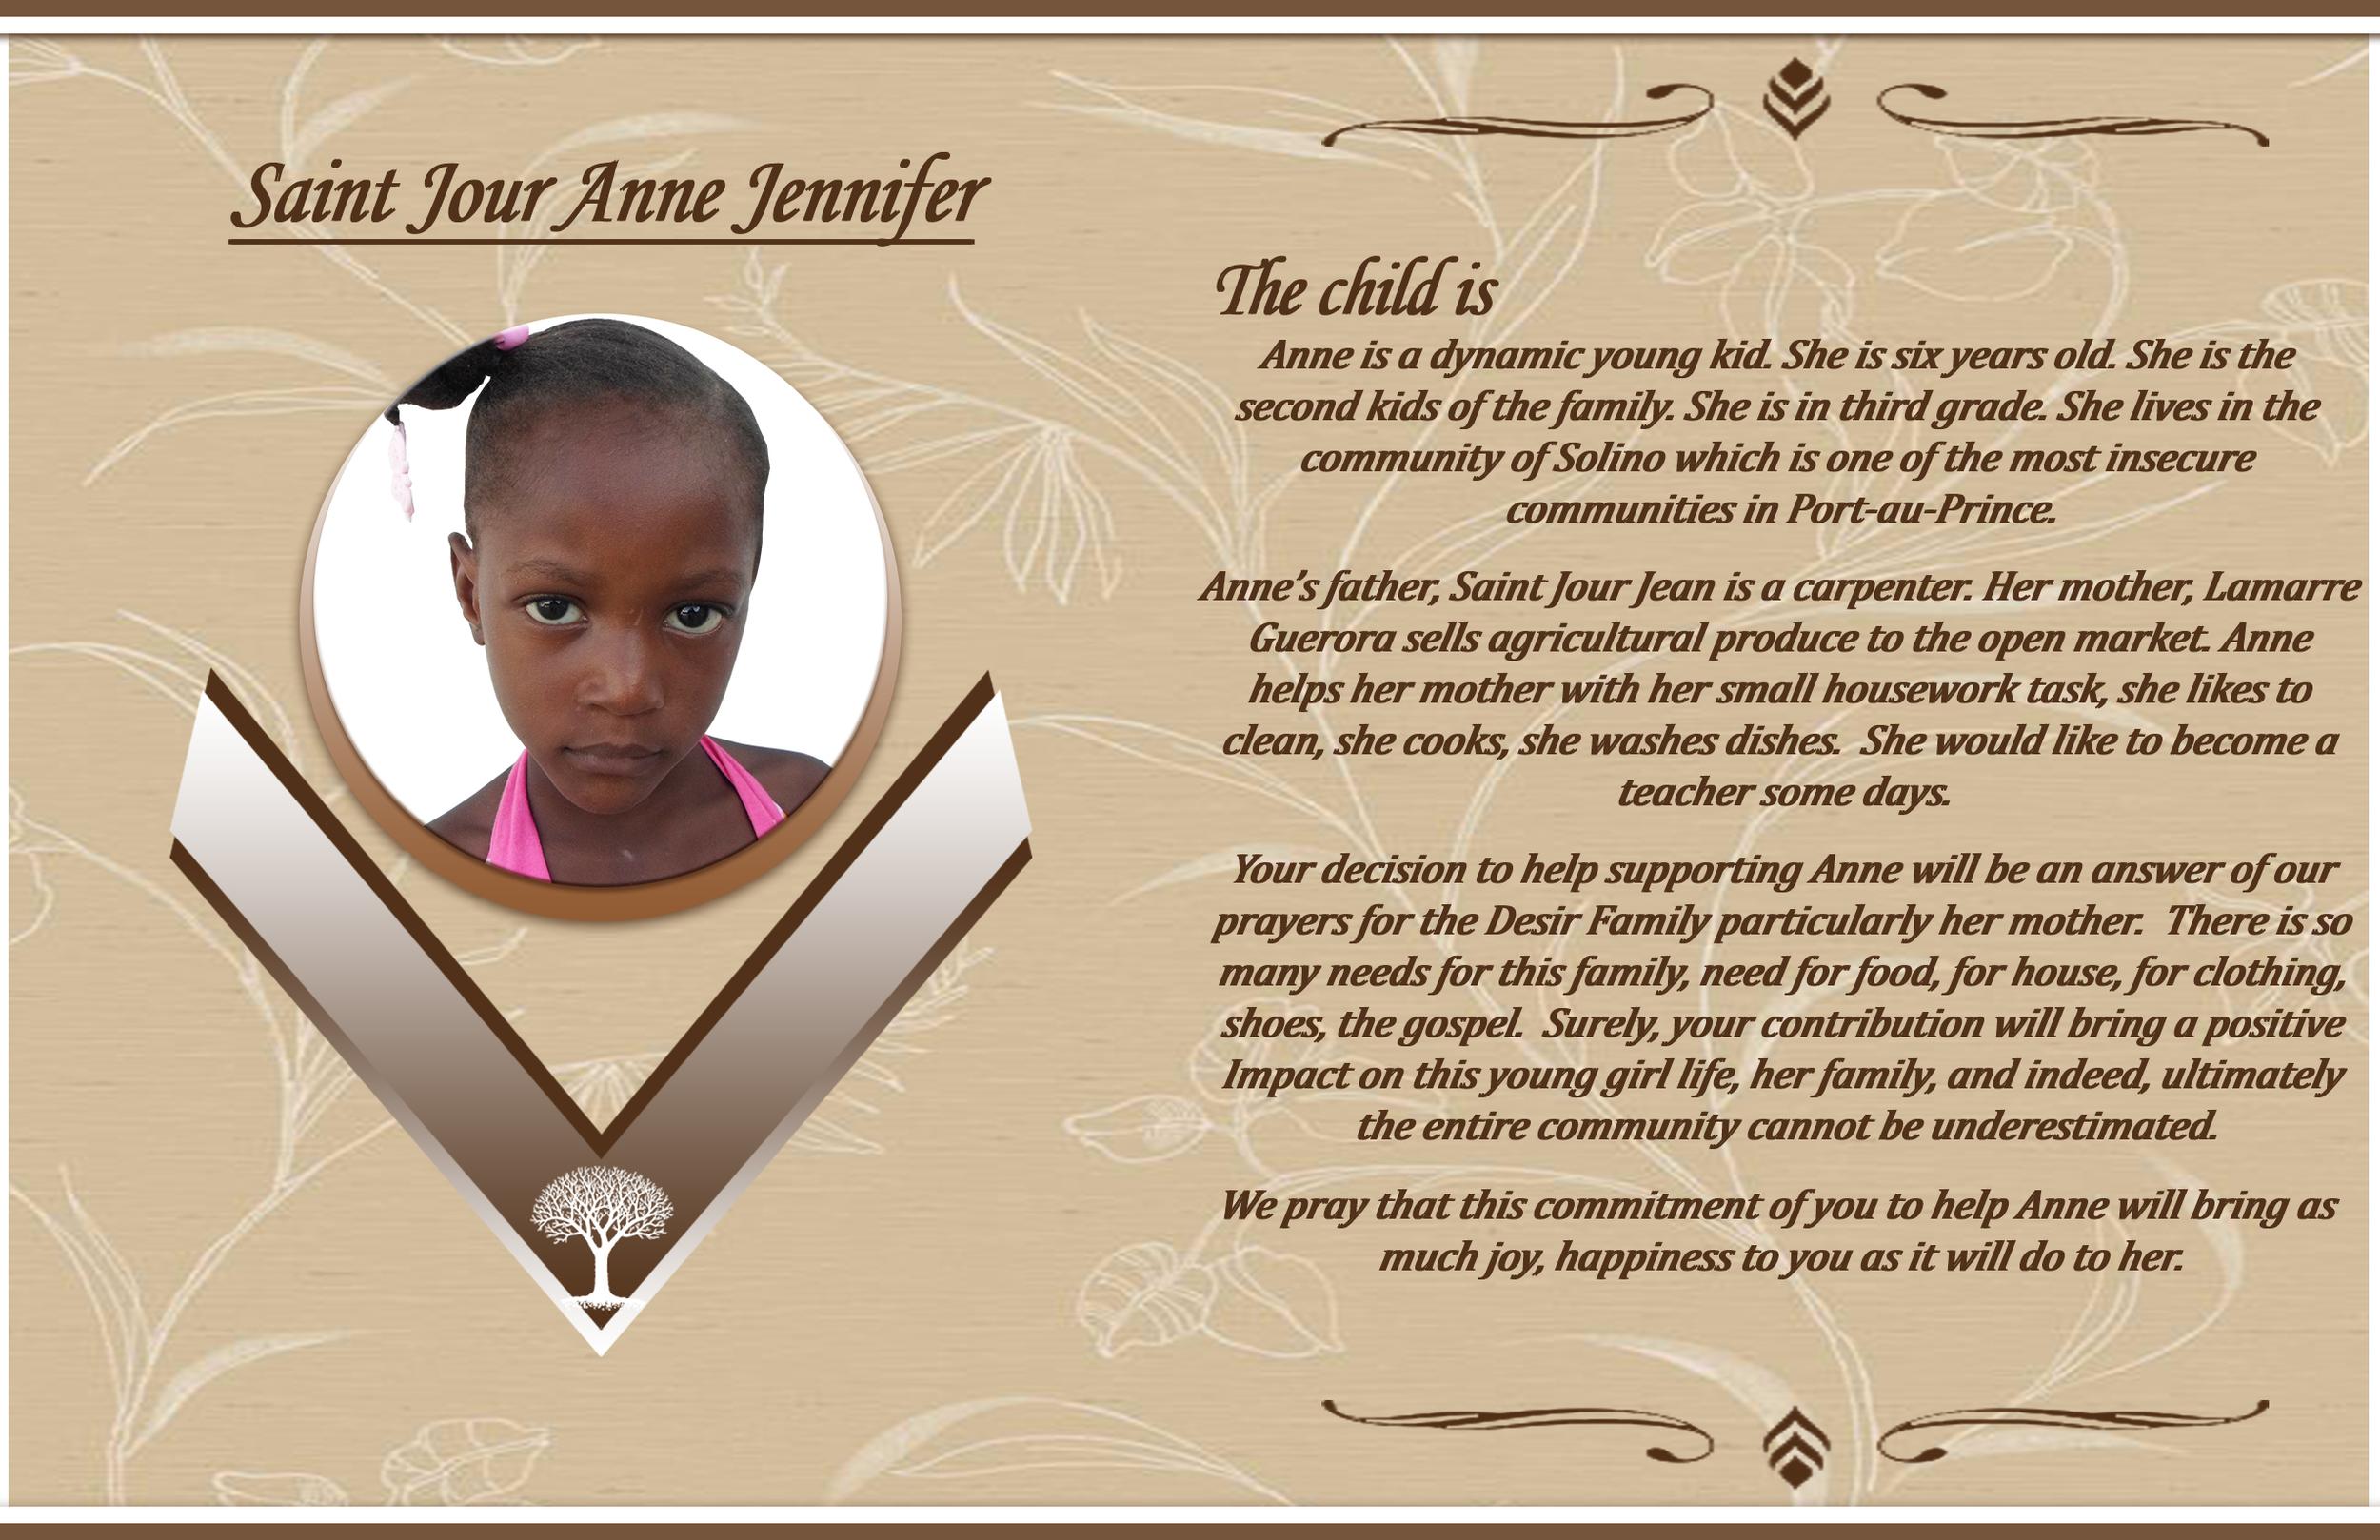 9) Saint Jour Anne Jennifer.jpg